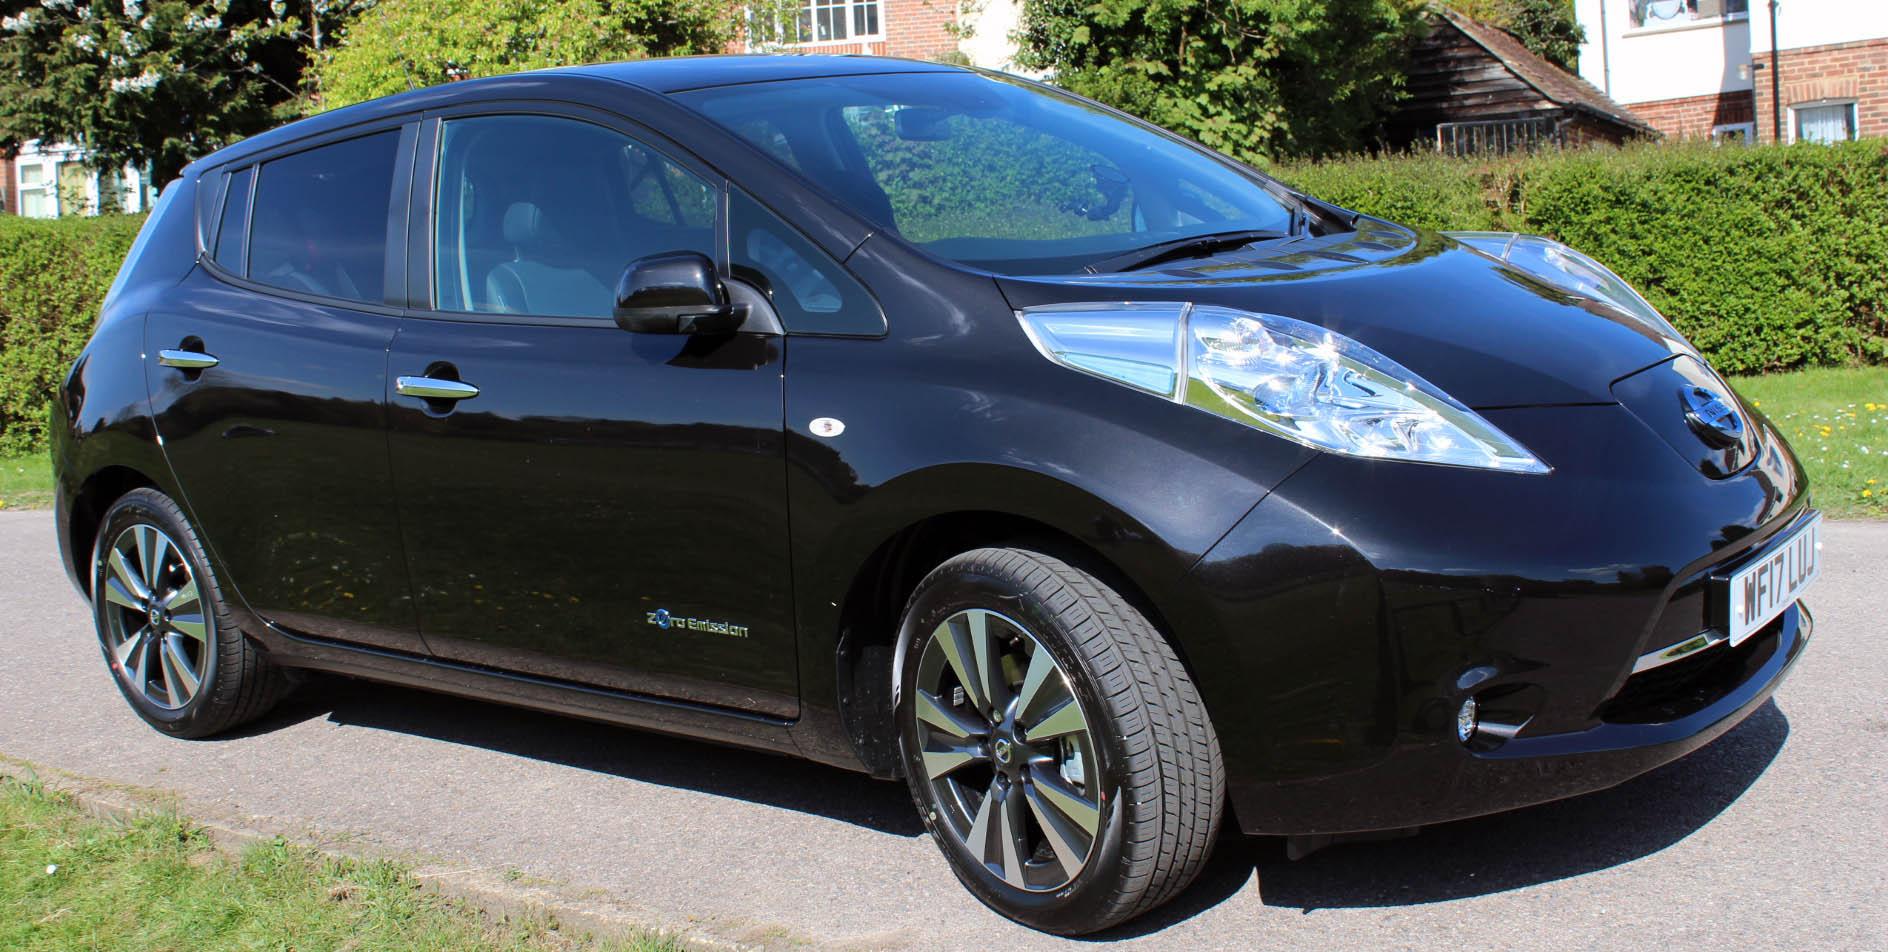 Nissan Leaf, EVr Go Electric, dadbloguk, dadbloguk.com, electric cars, electric car reviews